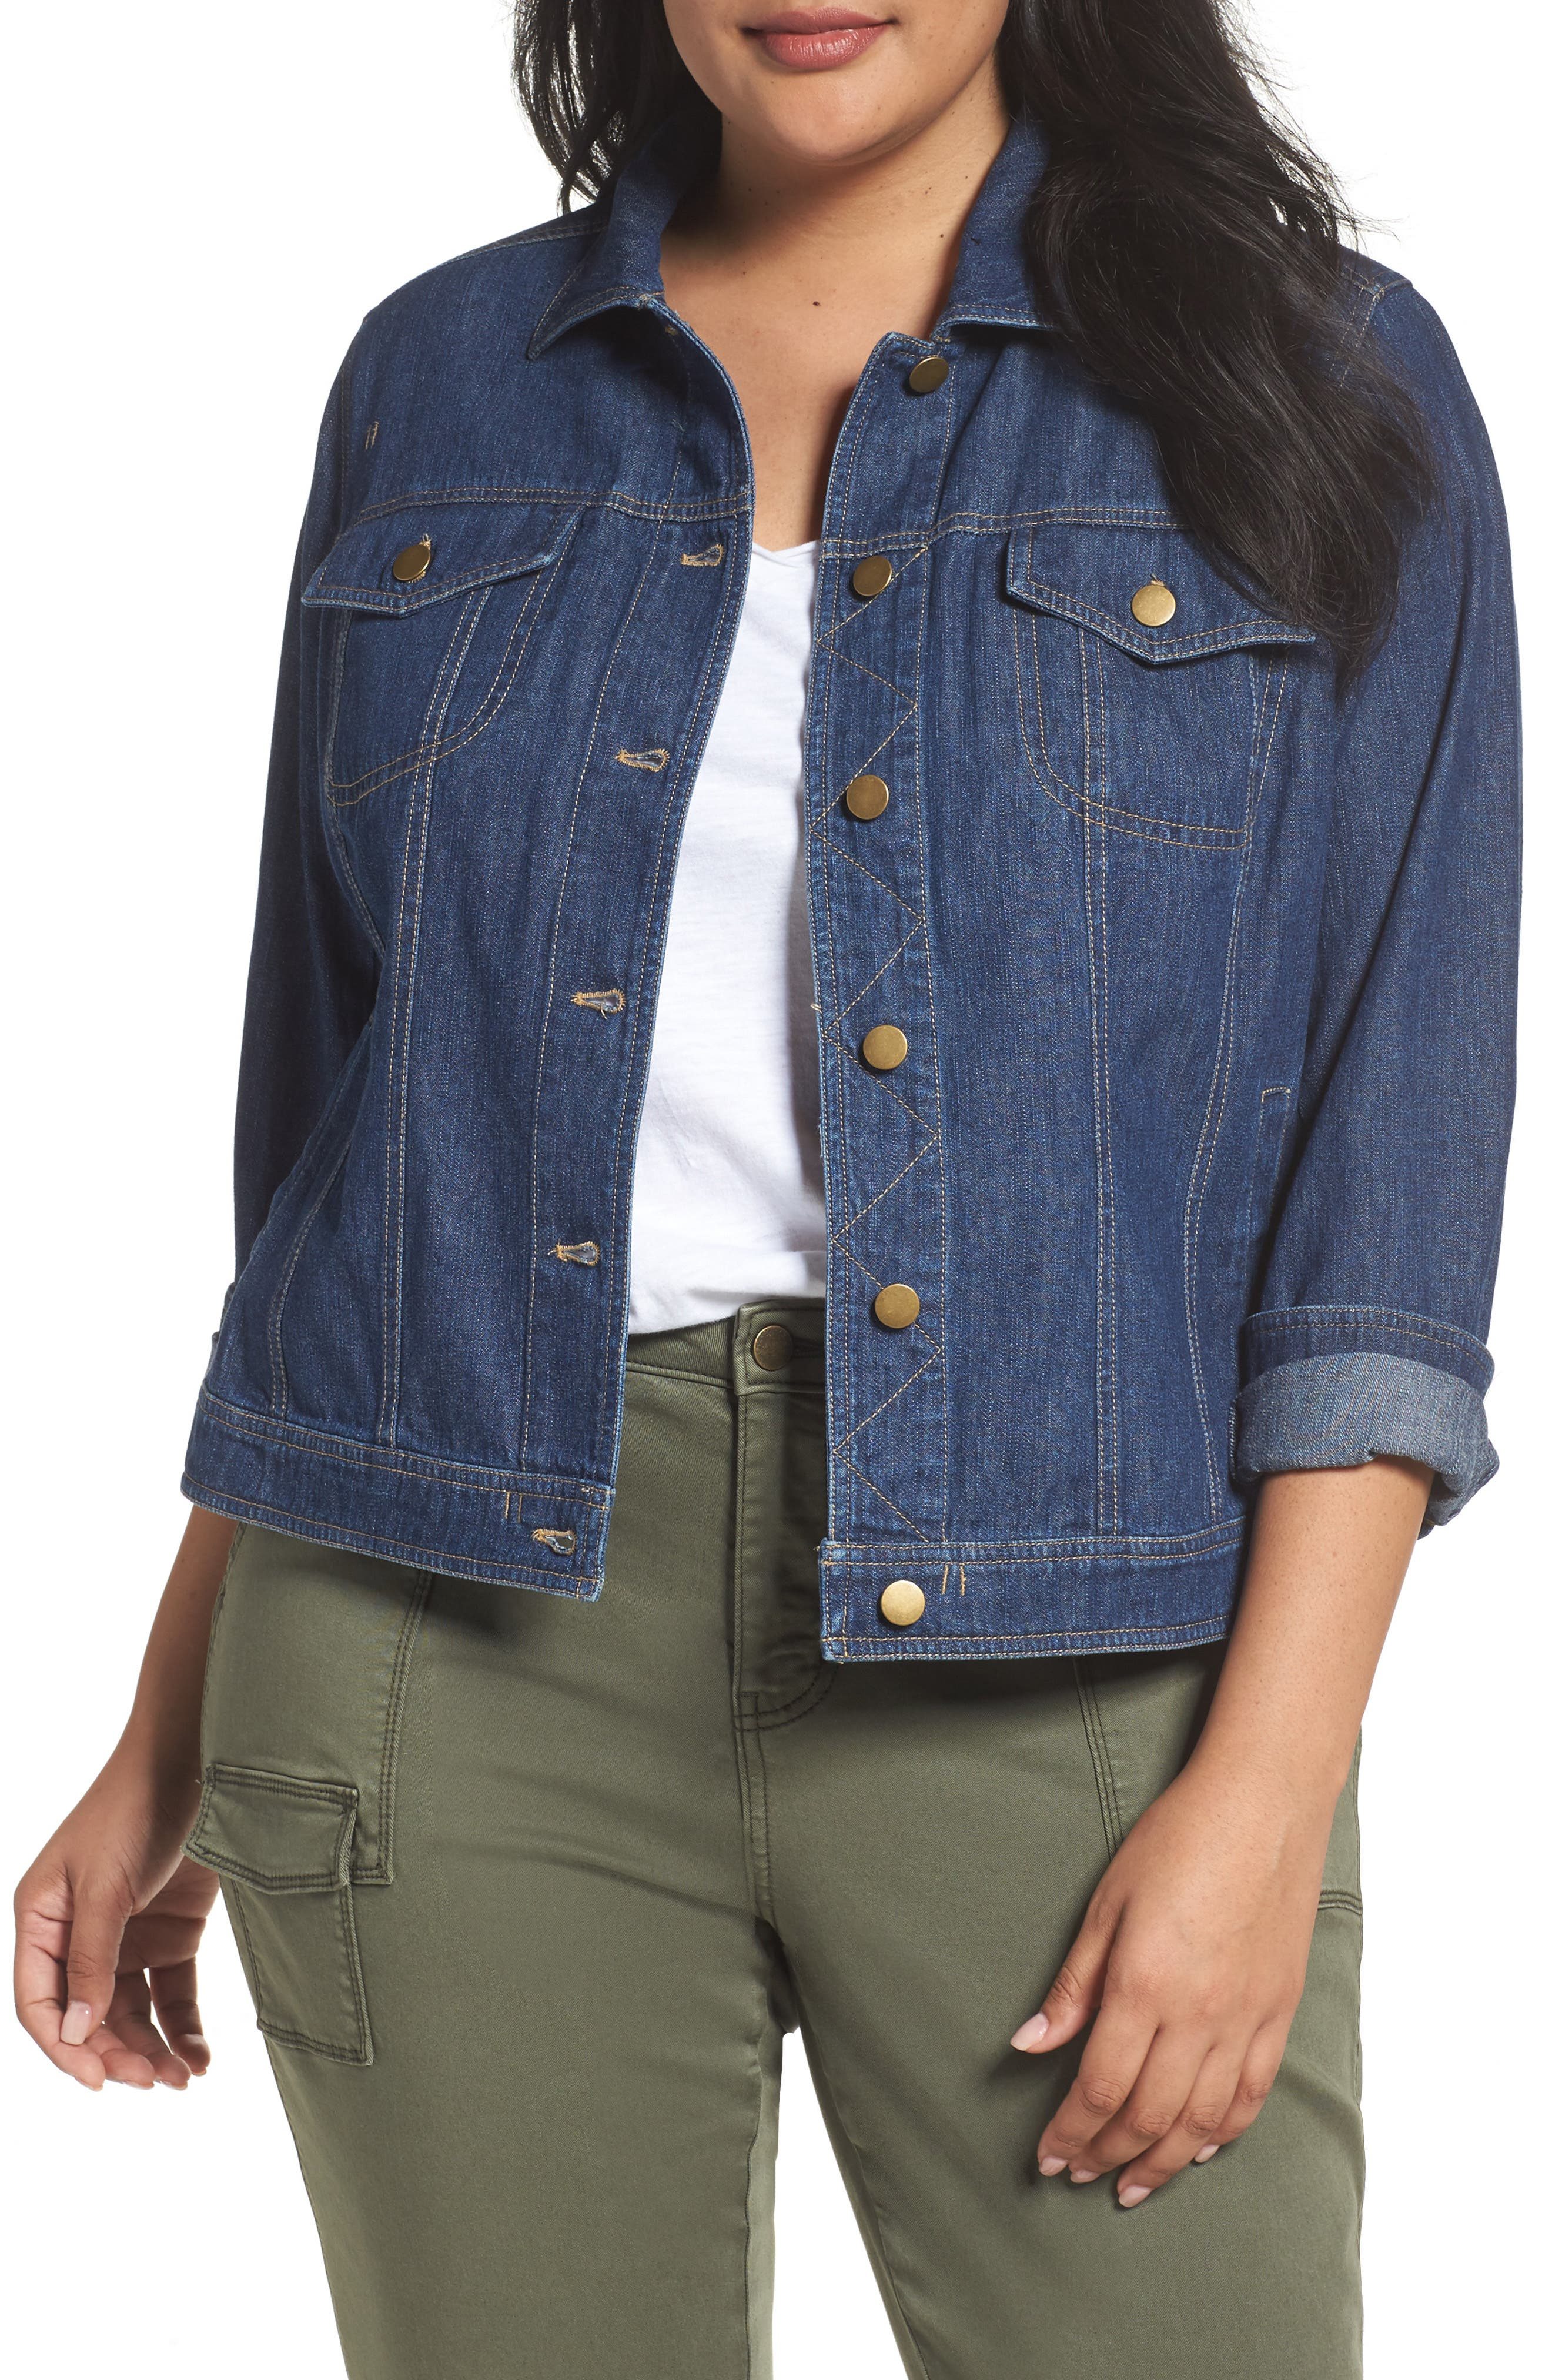 Alternate Image 1 Selected - Sejour Denim Jacket (Plus Size)